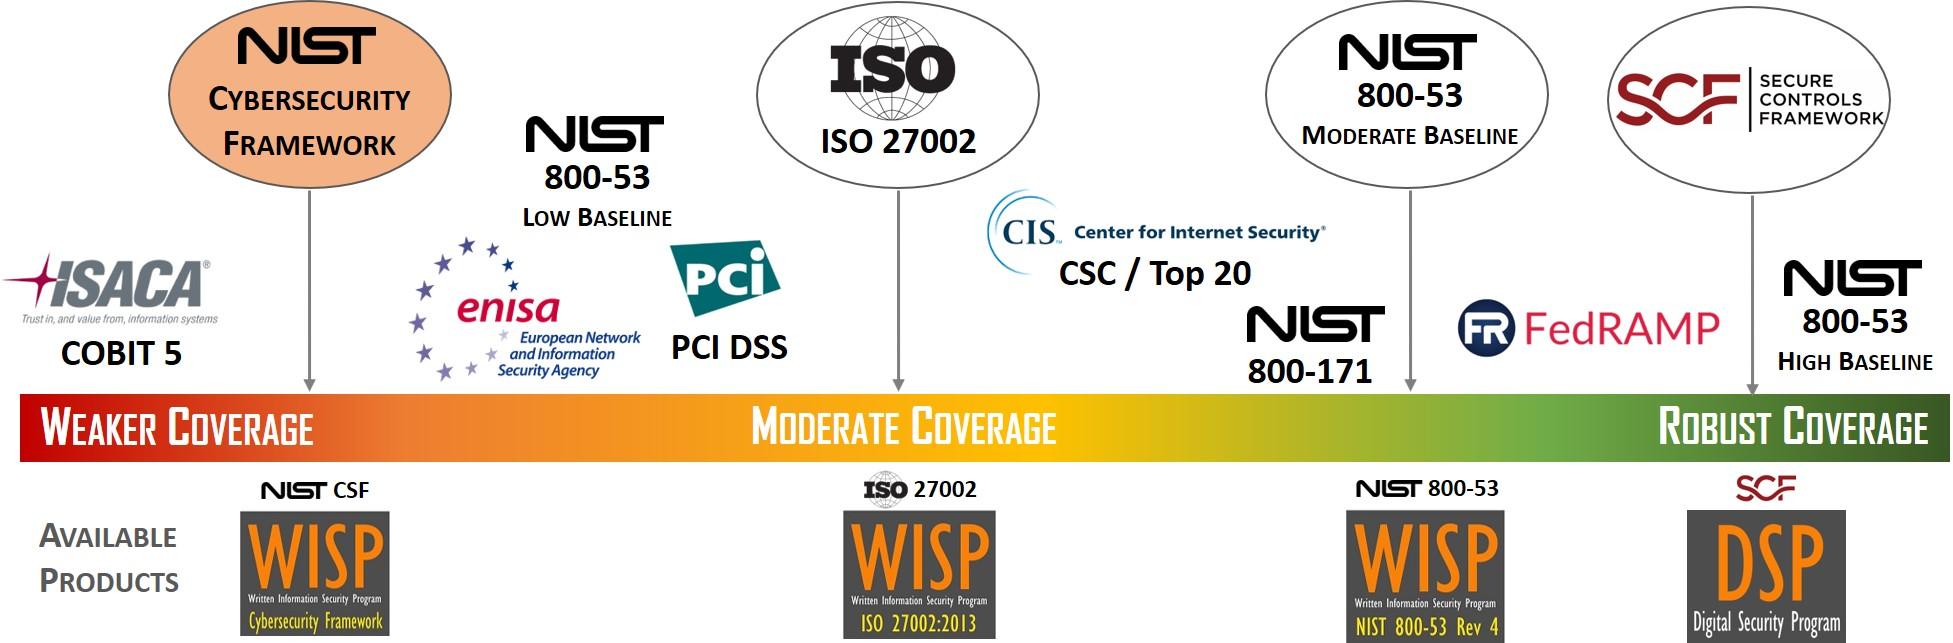 2018.1-cybersecurity-best-practices-spectrum-nist-csf-vs-iso-27002-vs-nist-800-53-nist-cybersecurity-framework-highlight.jpg